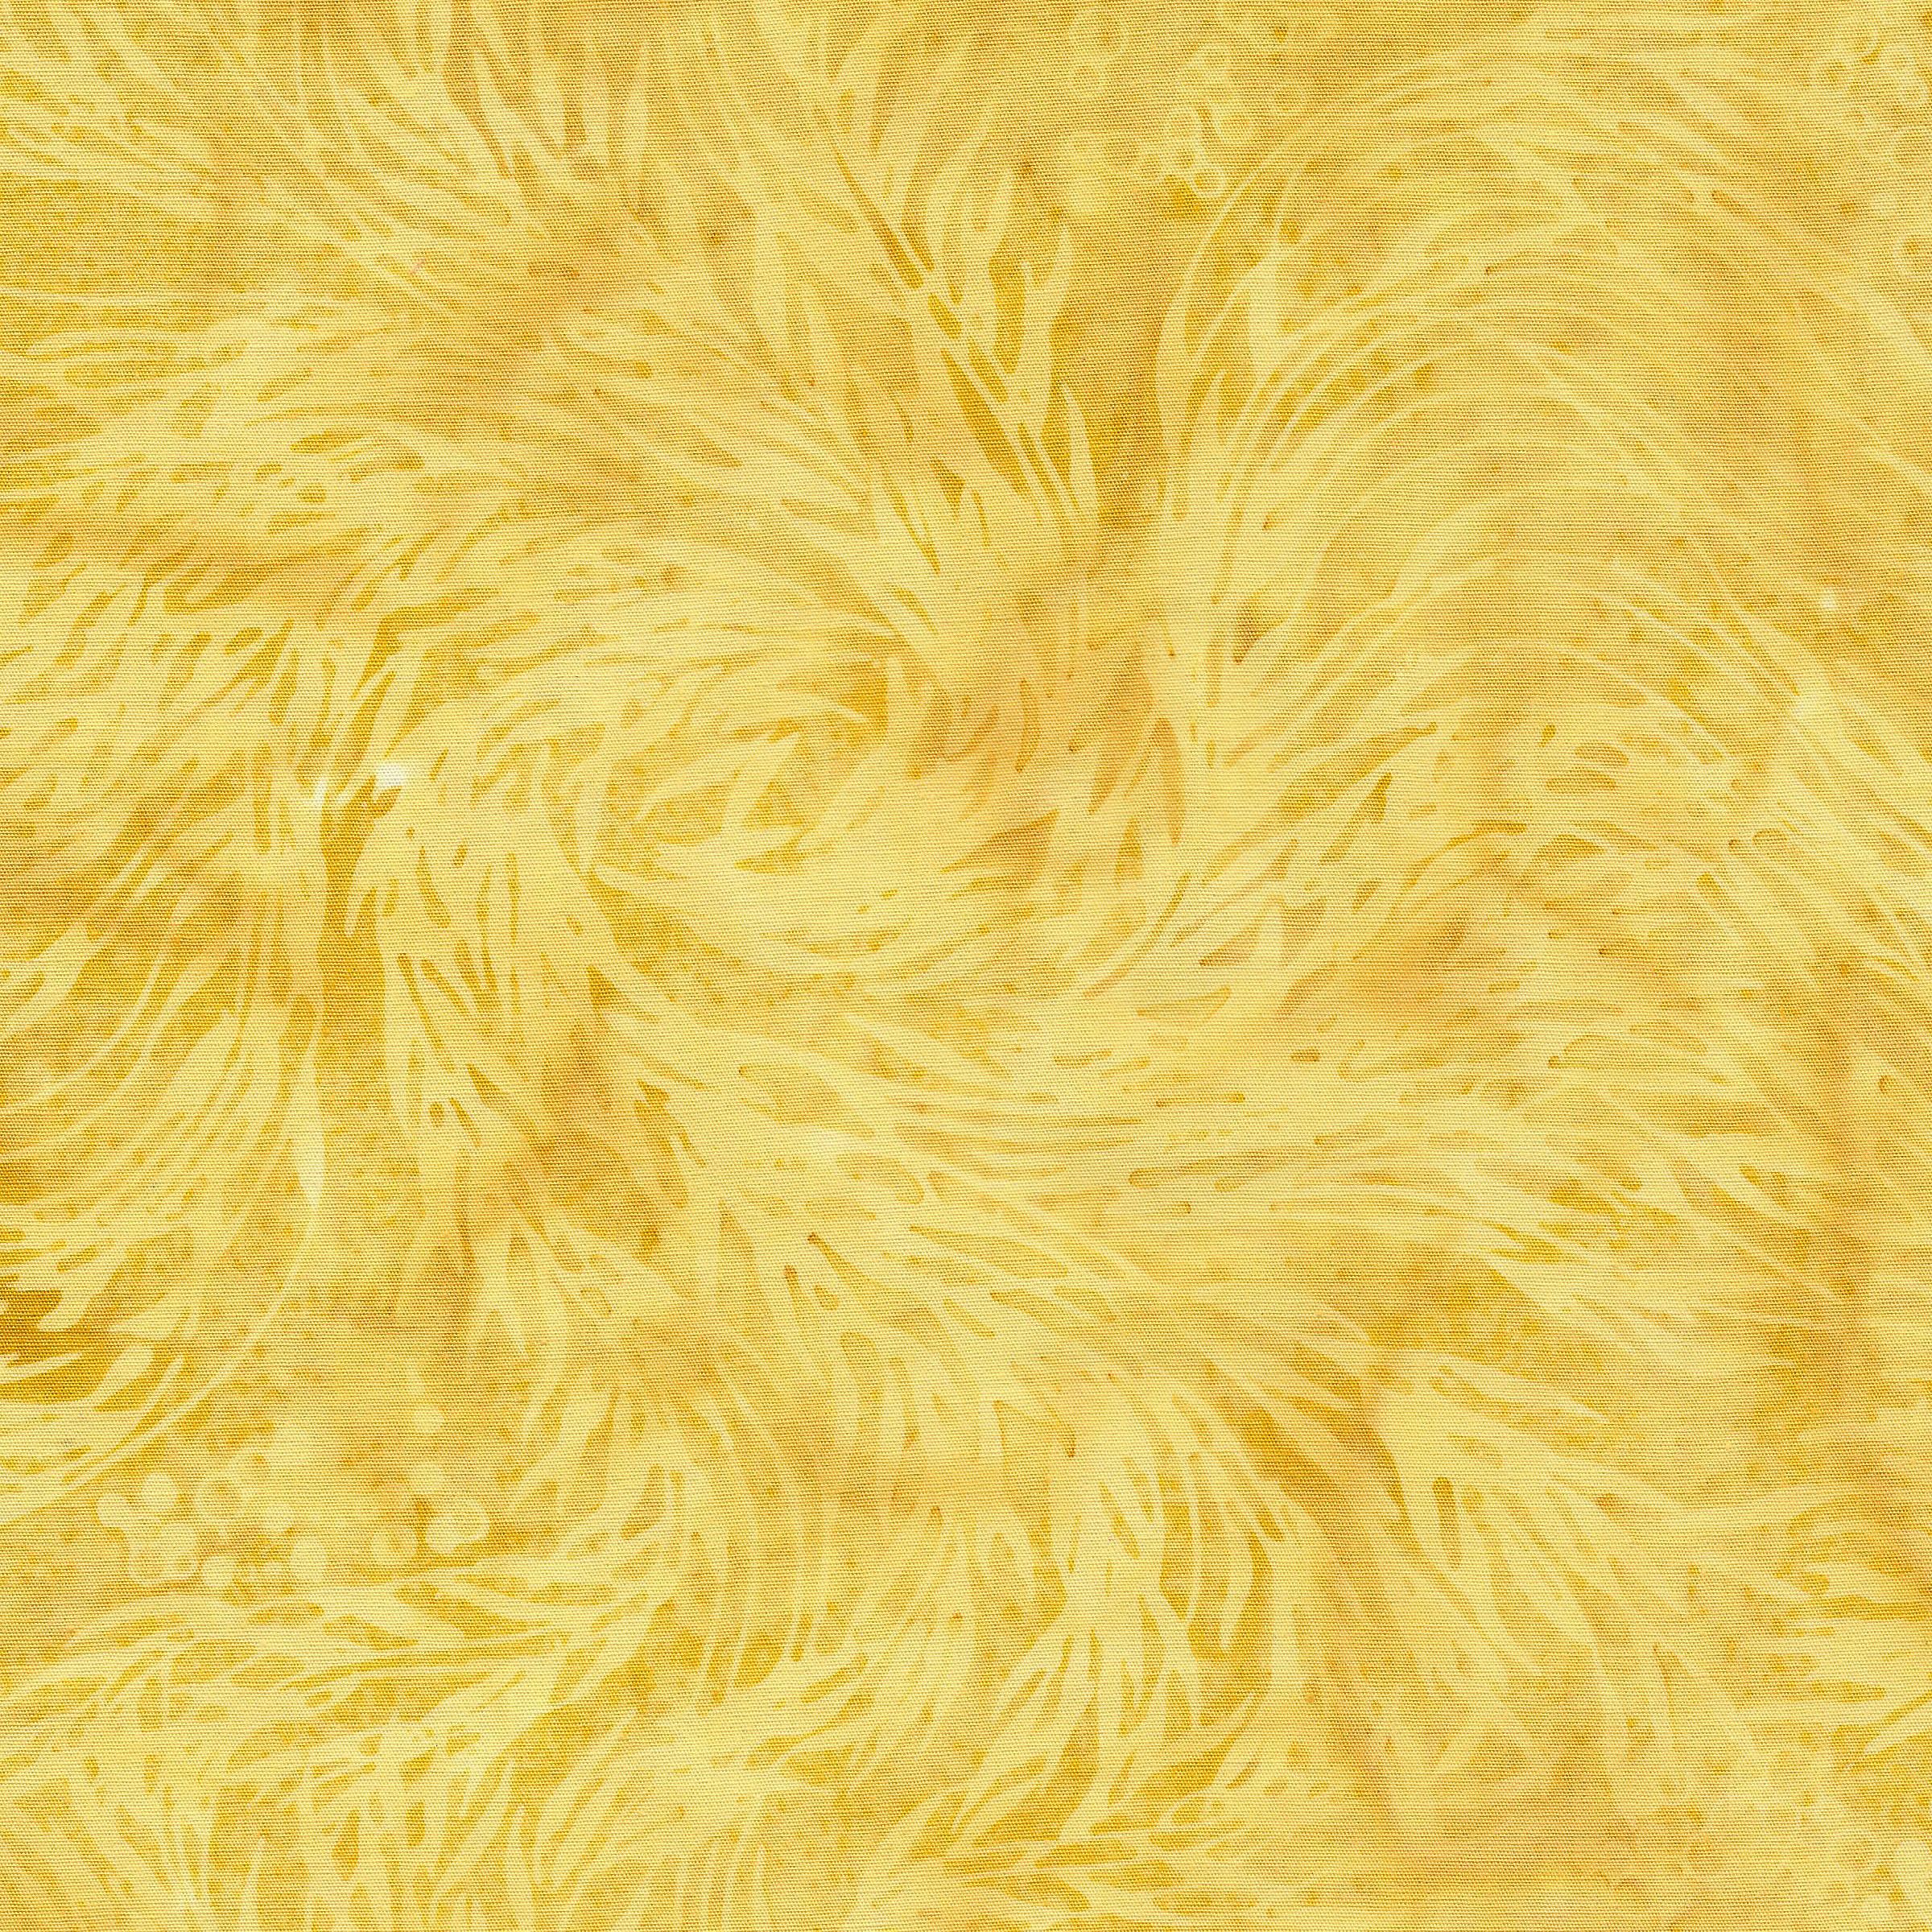 111913038 / Swirl Kelp-Hay